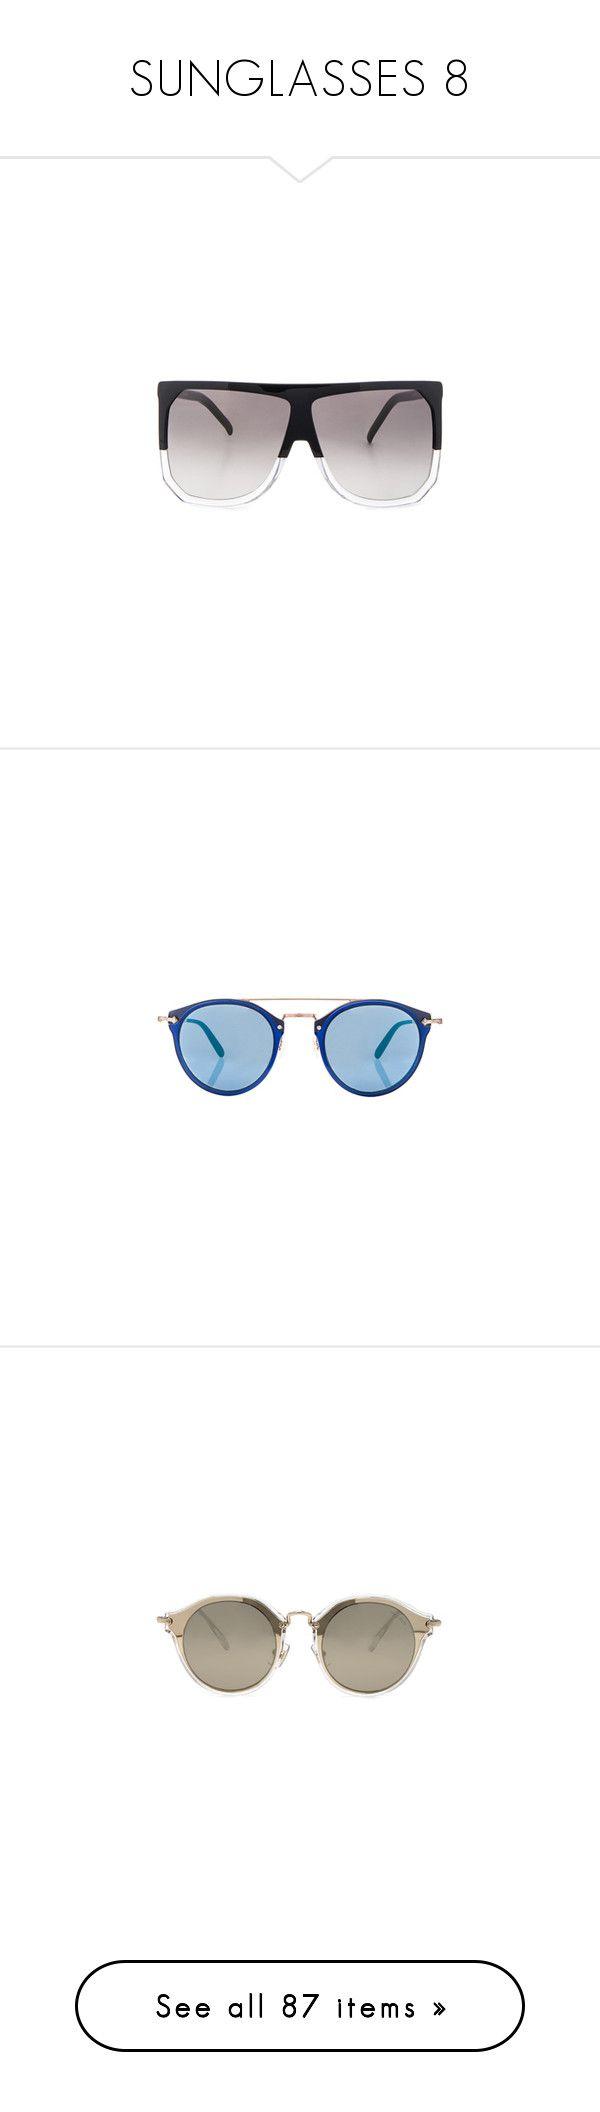 """SUNGLASSES 8"" by donnatellmeno ❤ liked on Polyvore featuring accessories, eyewear, sunglasses, checkered sunglasses, green, green sunglasses, dolce gabbana eyewear, swarovski crystal sunglasses, round frame glasses and round sunglasses"